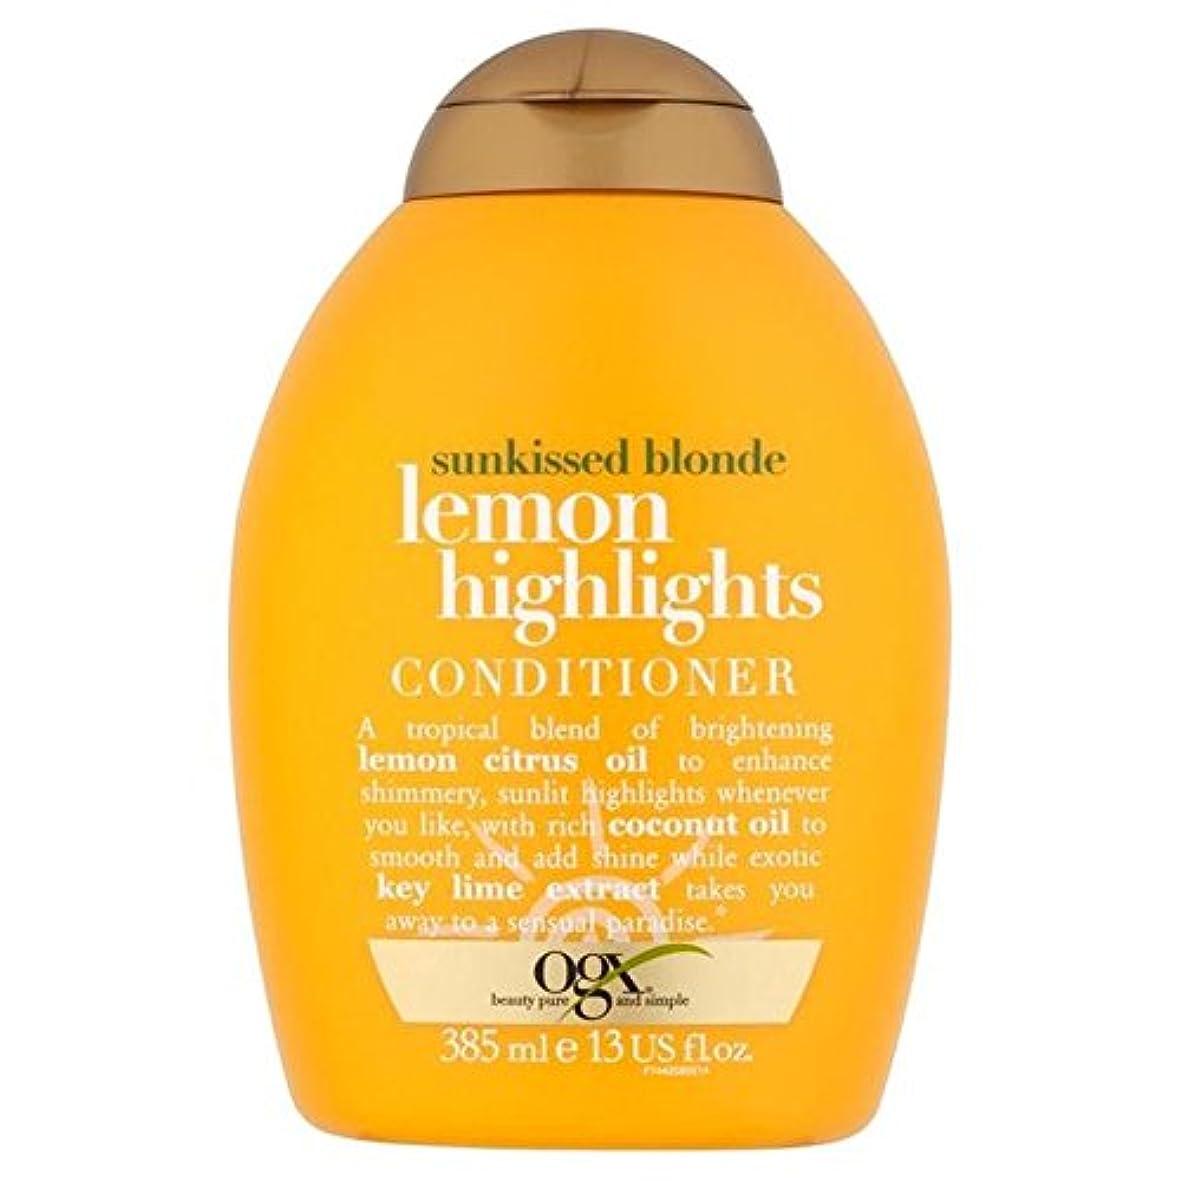 Ogx Blonde Lemon Highlights Conditioner 385ml - ブロンドレモンハイライトコンディショナー385ミリリットル [並行輸入品]